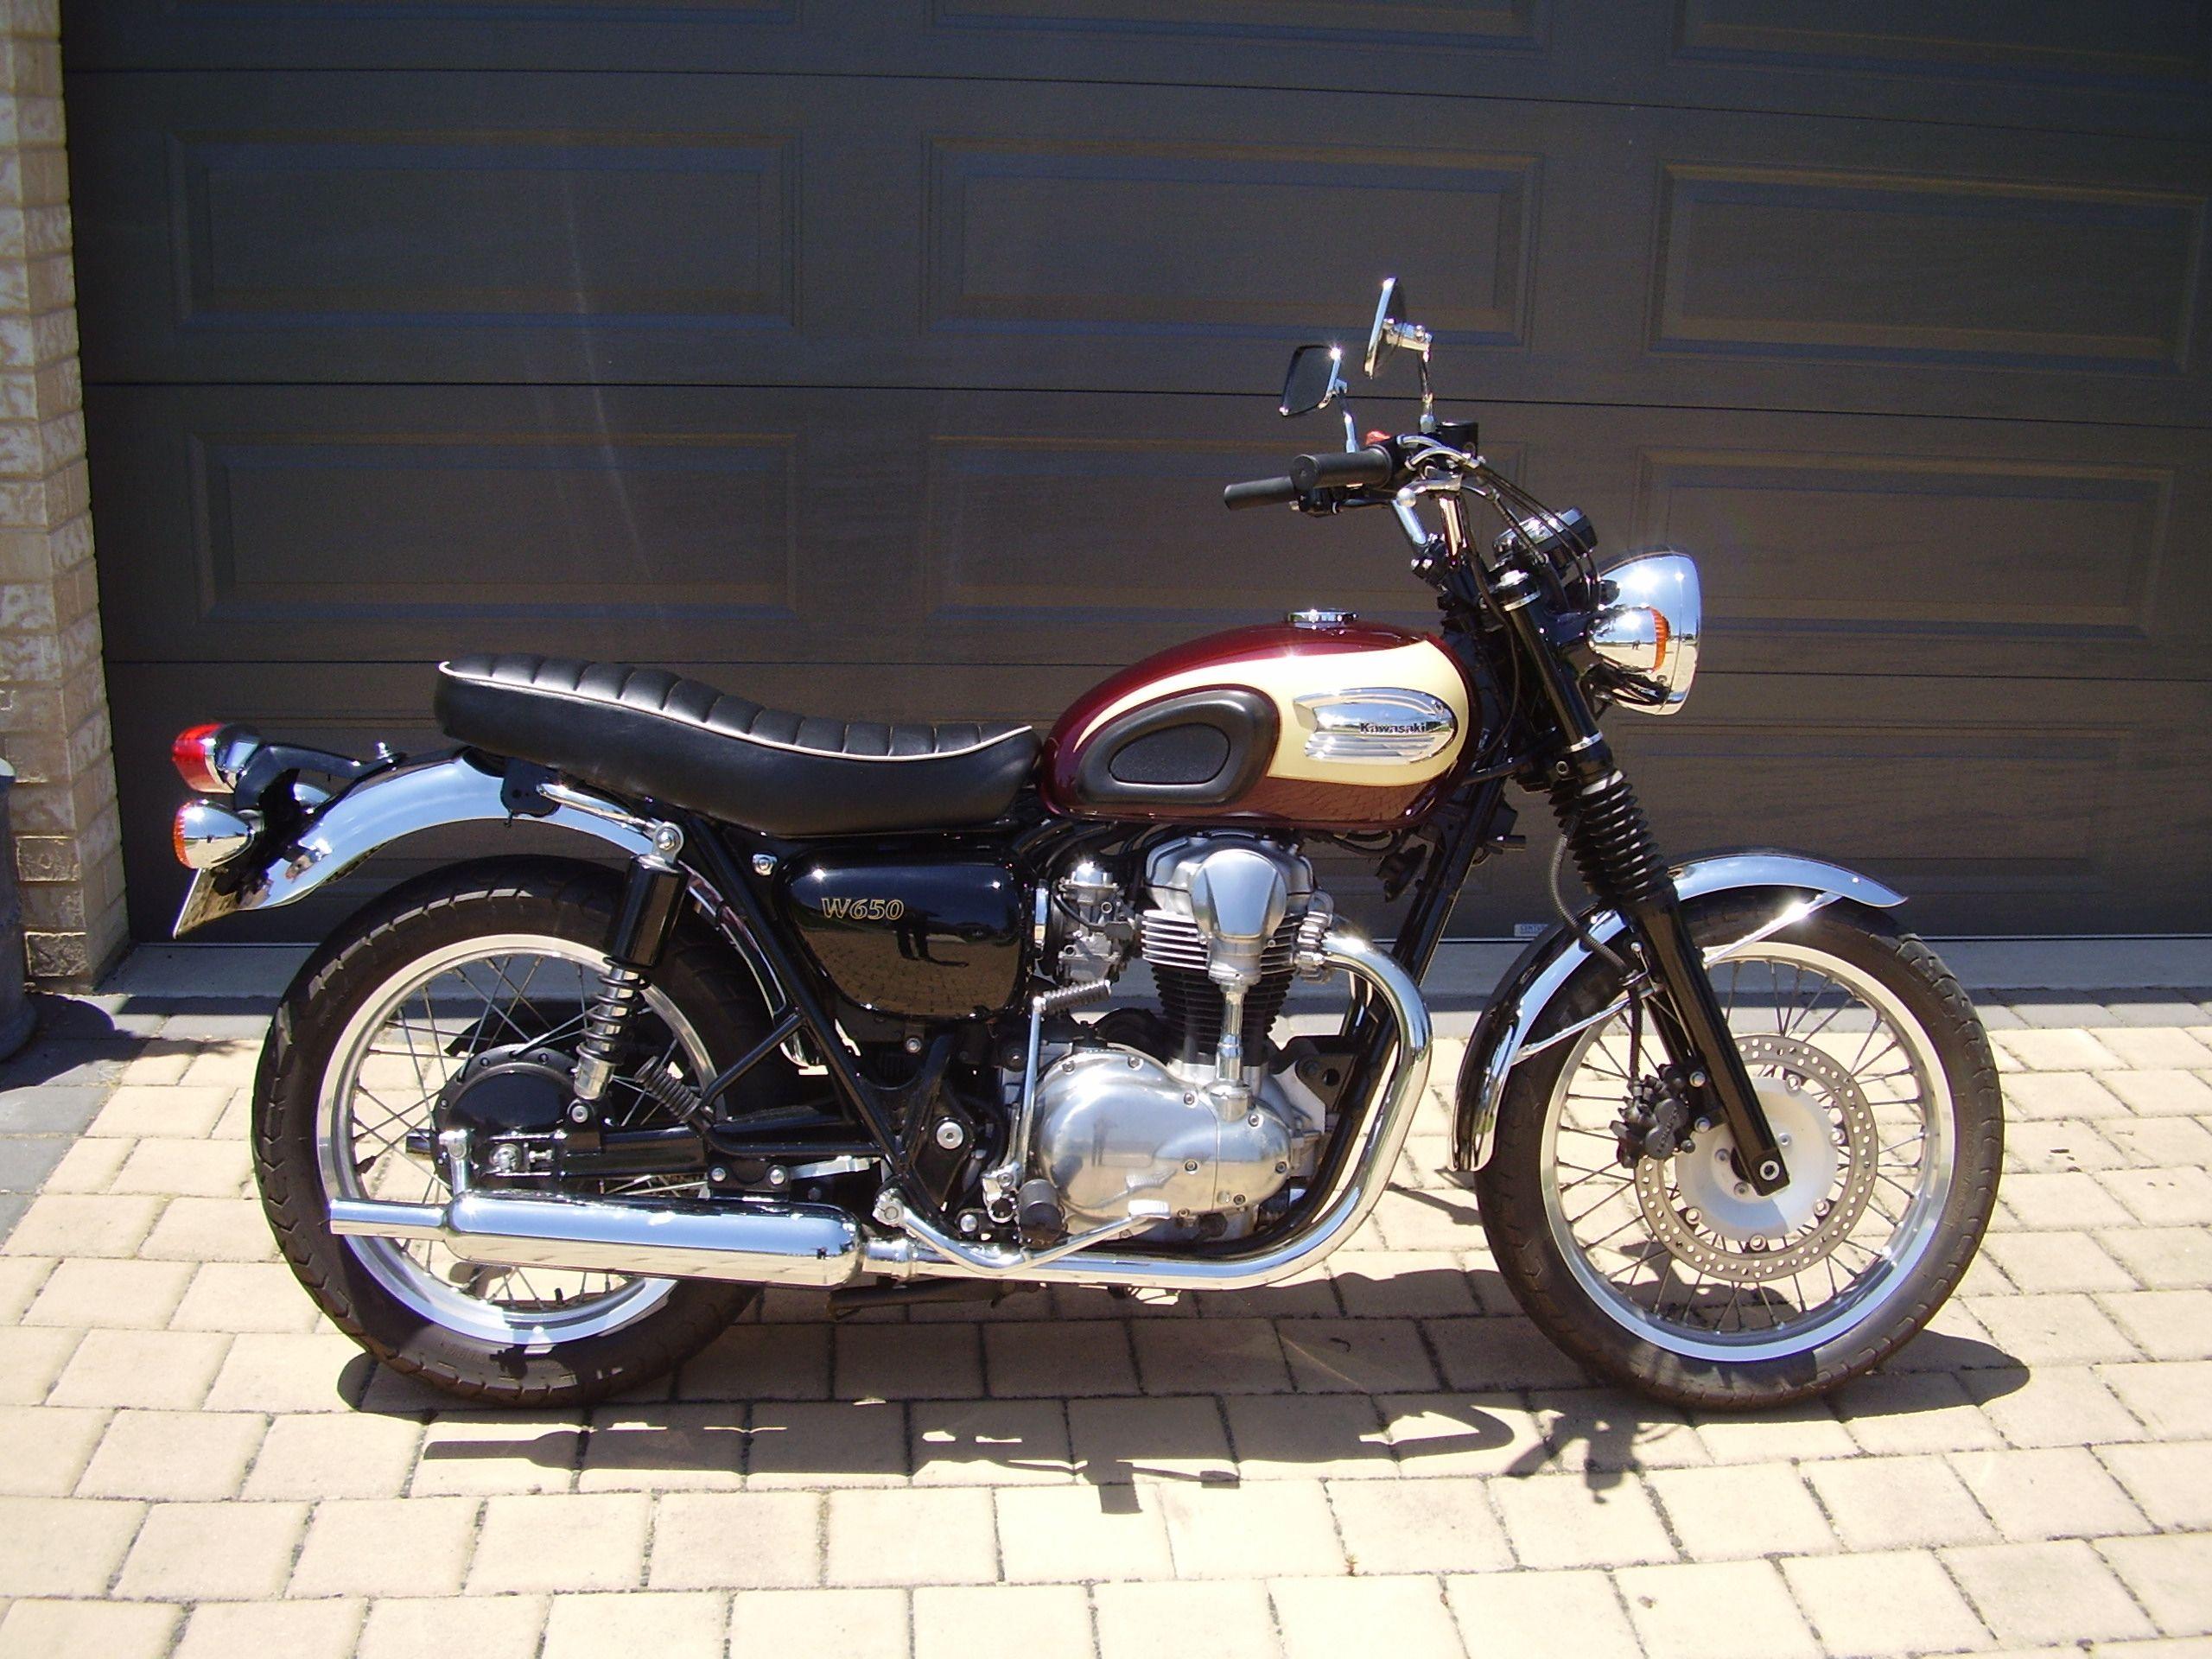 File:Kawasaki W650 (1).JPG - Wikimedia Commons